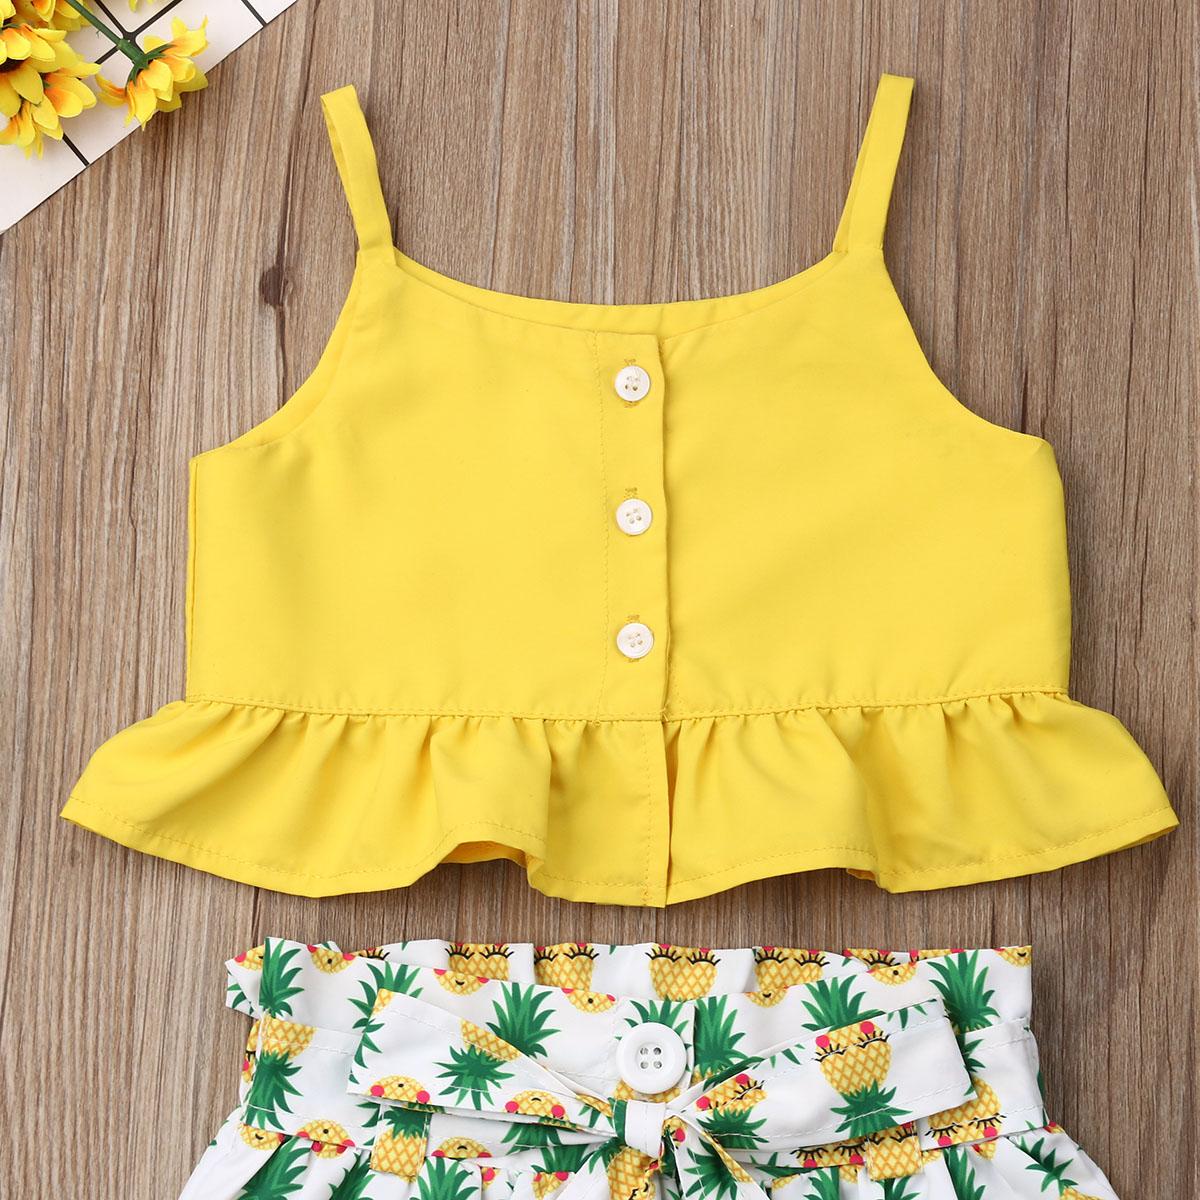 KiKibaby Baby Girls 2pcs Pineapple Short Sleeve Ruffle Tie Knot Crop Top+Skirt Sets